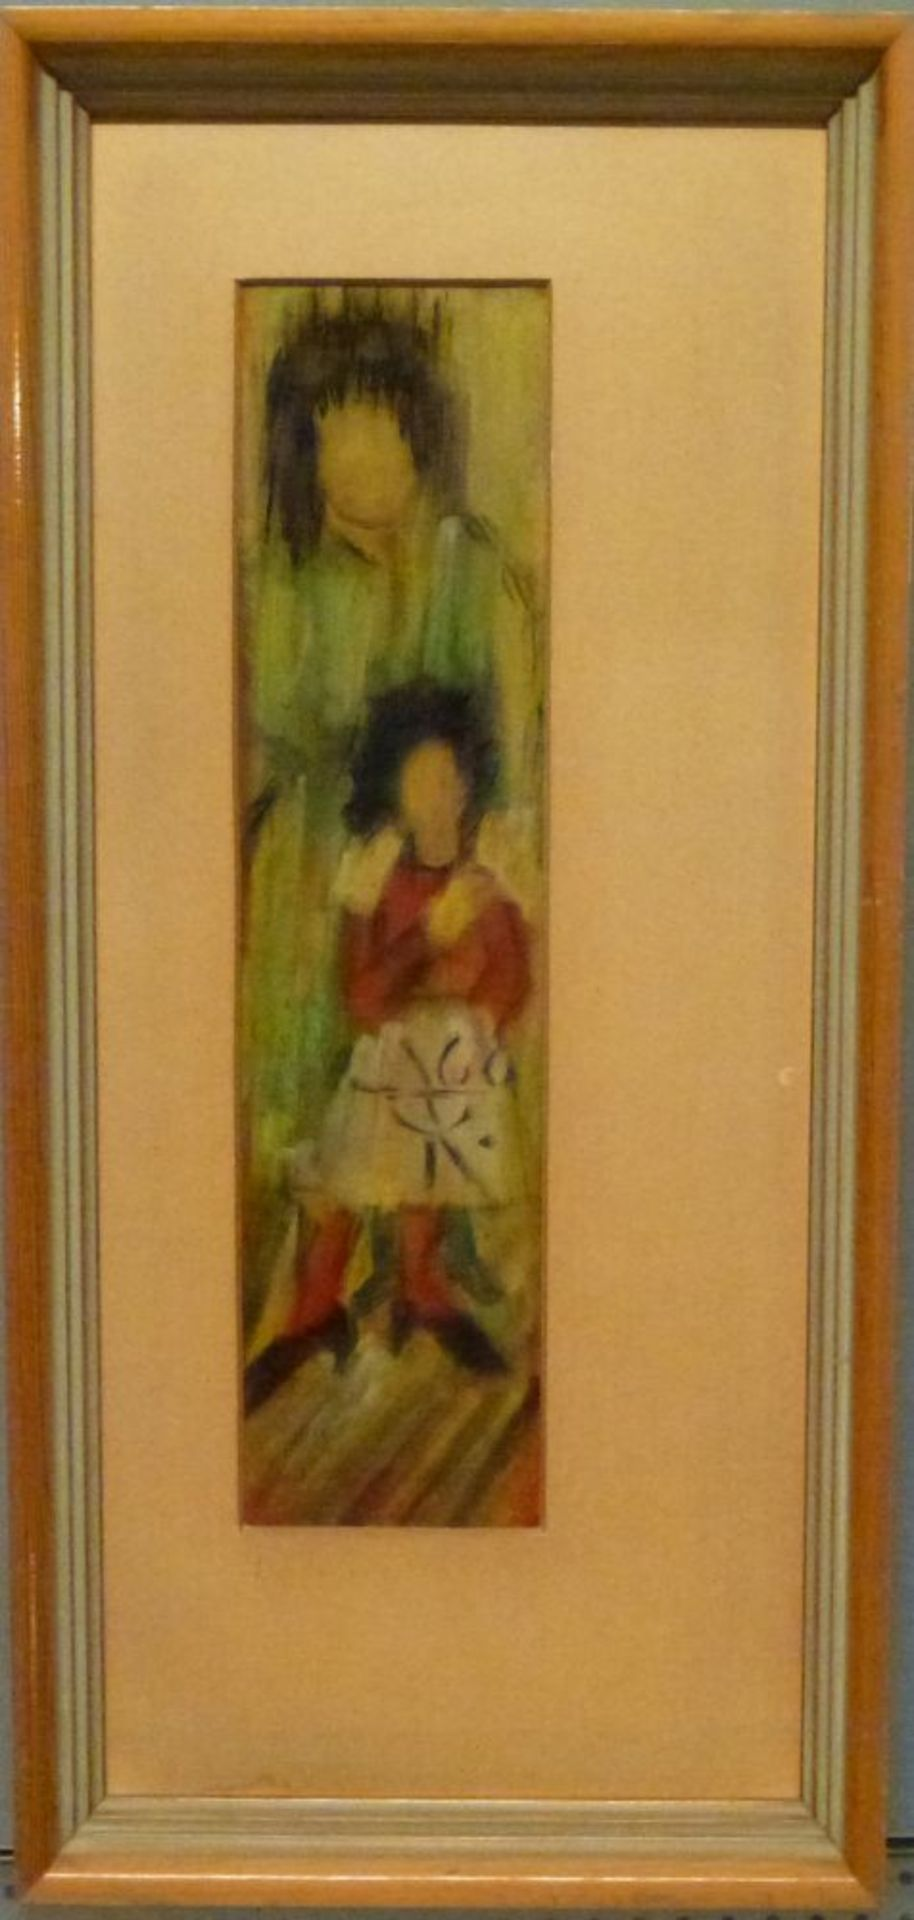 ''Erwartung'', Mitte 20.Jh.Hildegard KurpanTempera/Papier, monogr. u. dat. (19)60, Mutter mit - Bild 2 aus 2